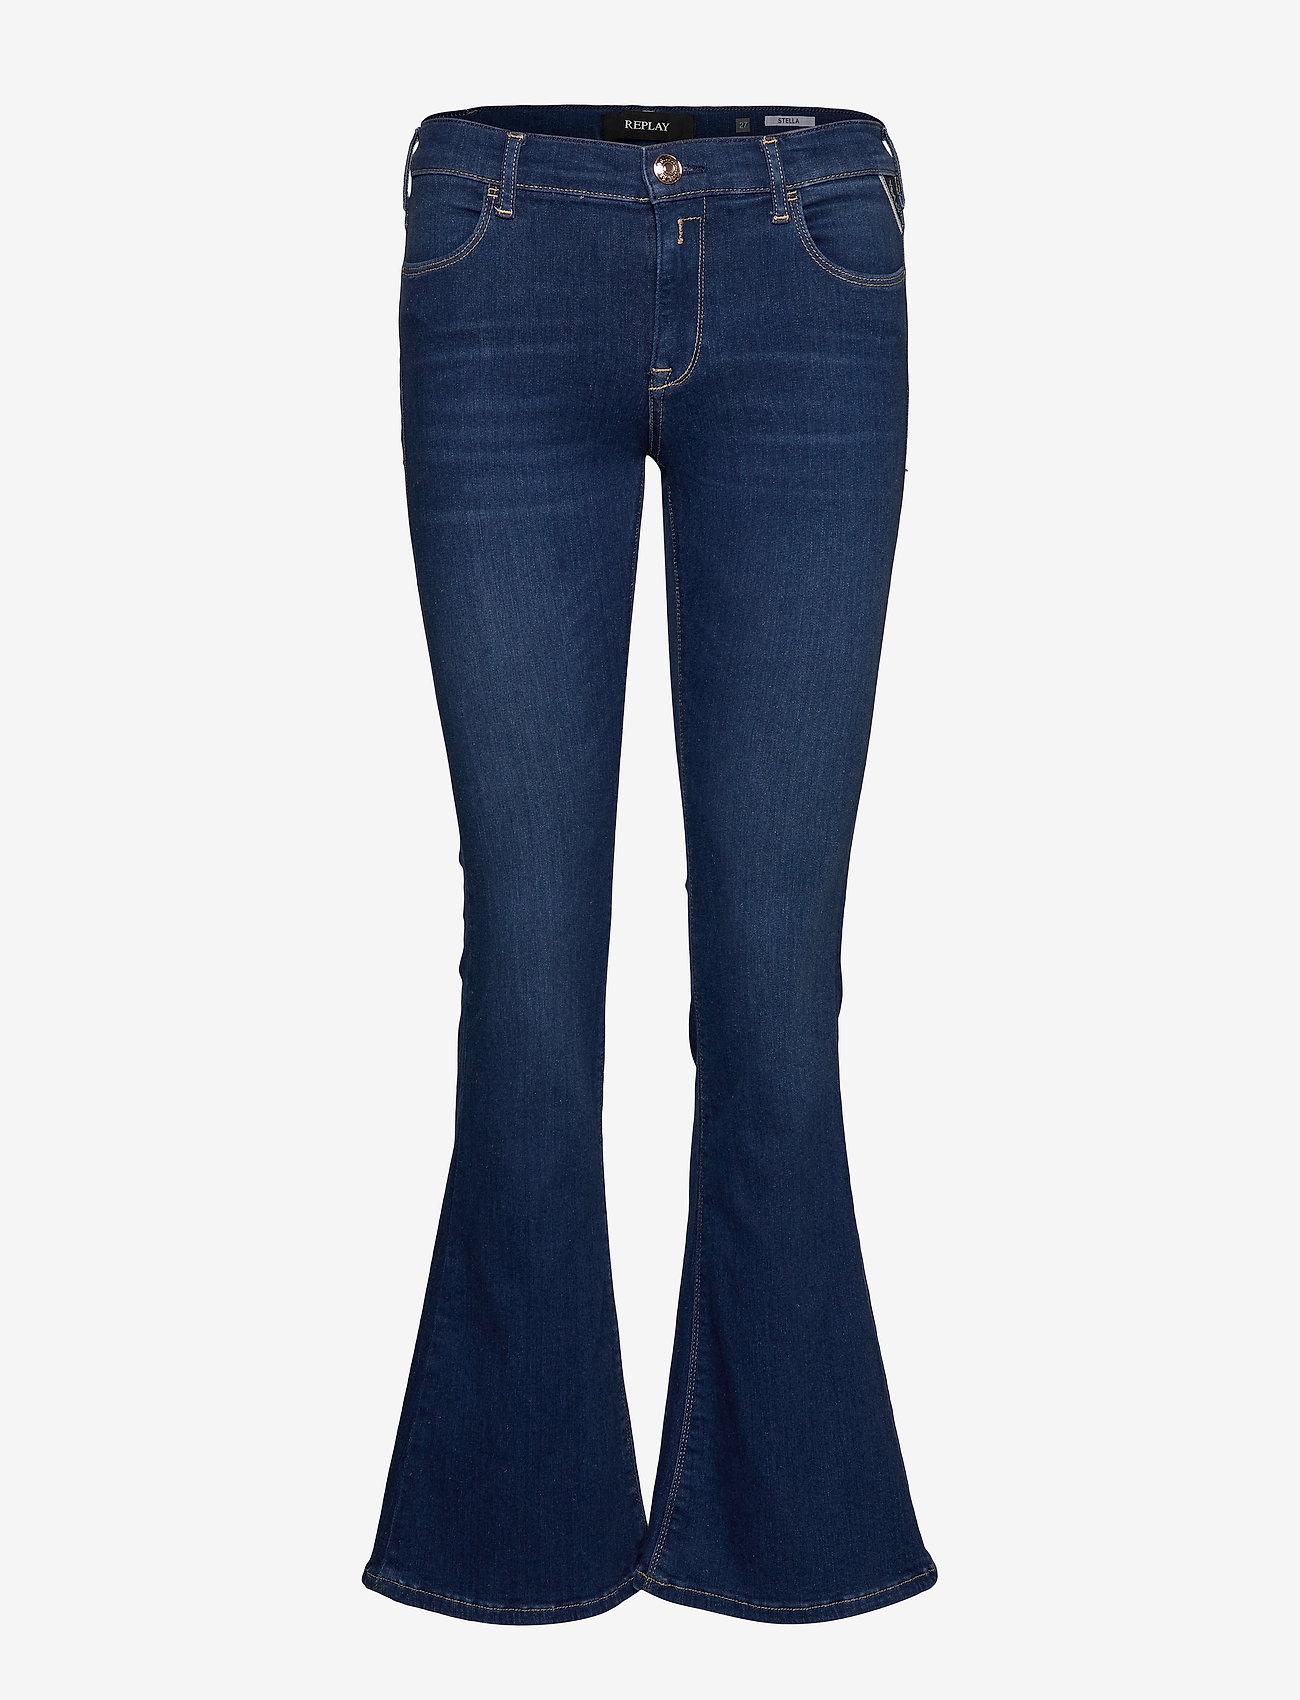 Replay - Shorts - schlaghosen - medium blue - 0